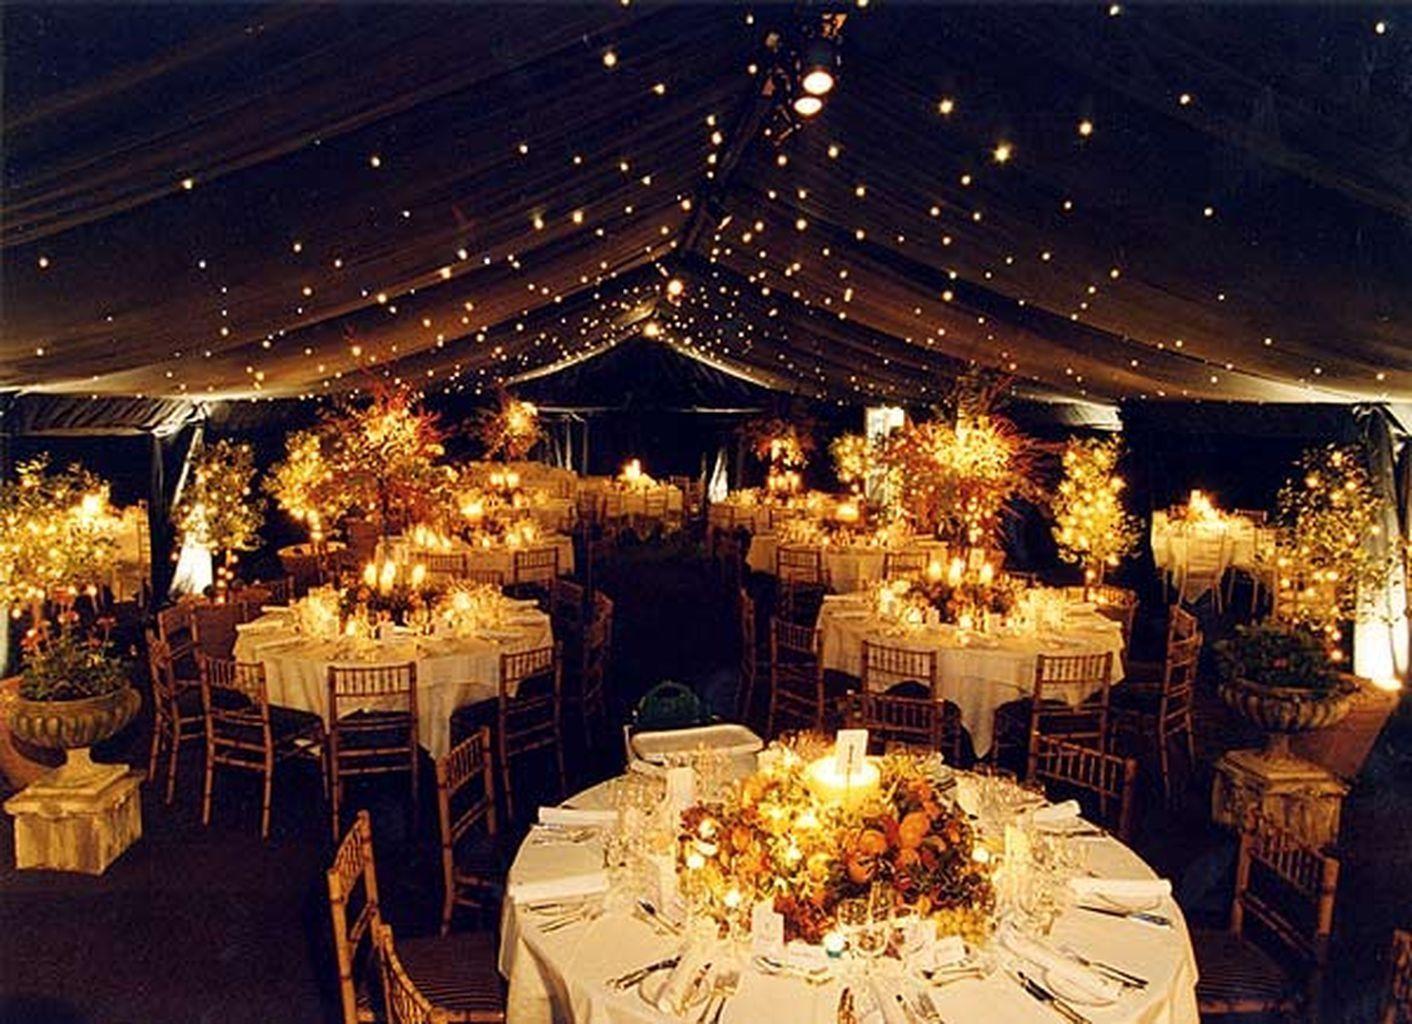 109 cheap but elegant outdoor wedding centerpieces ideas wedding 109 cheap but elegant outdoor wedding centerpieces ideas junglespirit Images